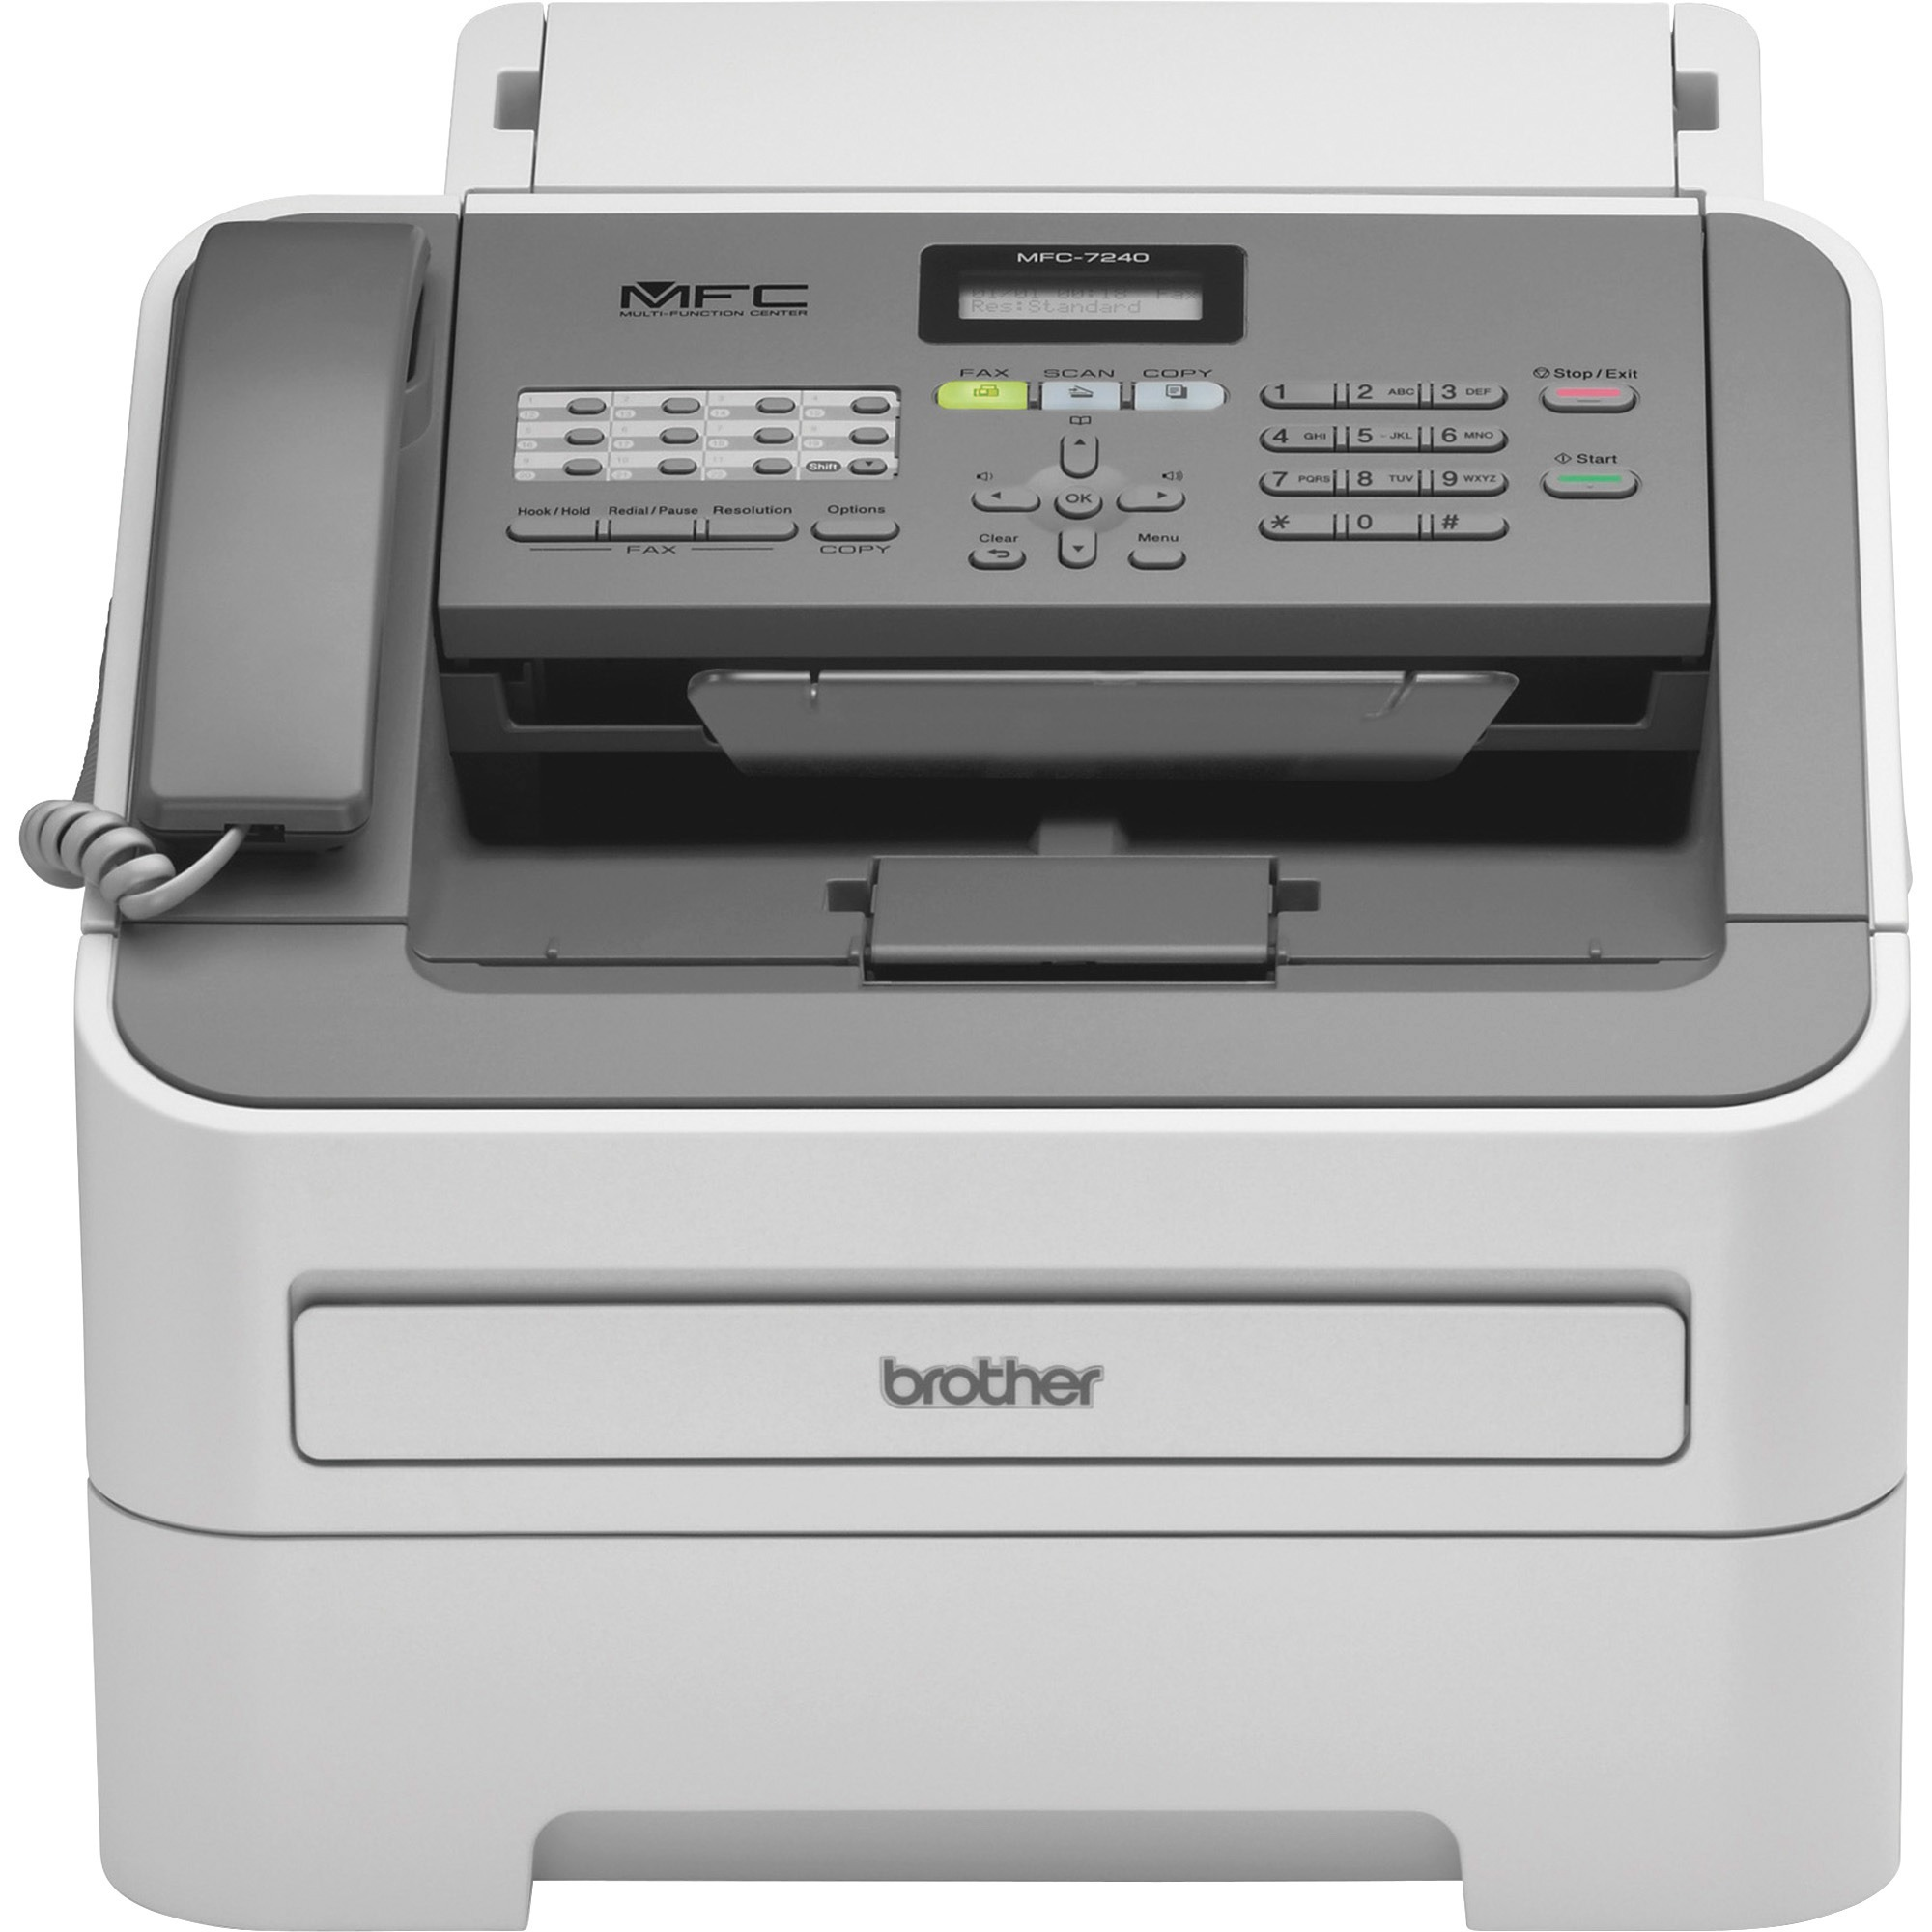 HOME :: Technology :: Printers, Multifunction, & Printing